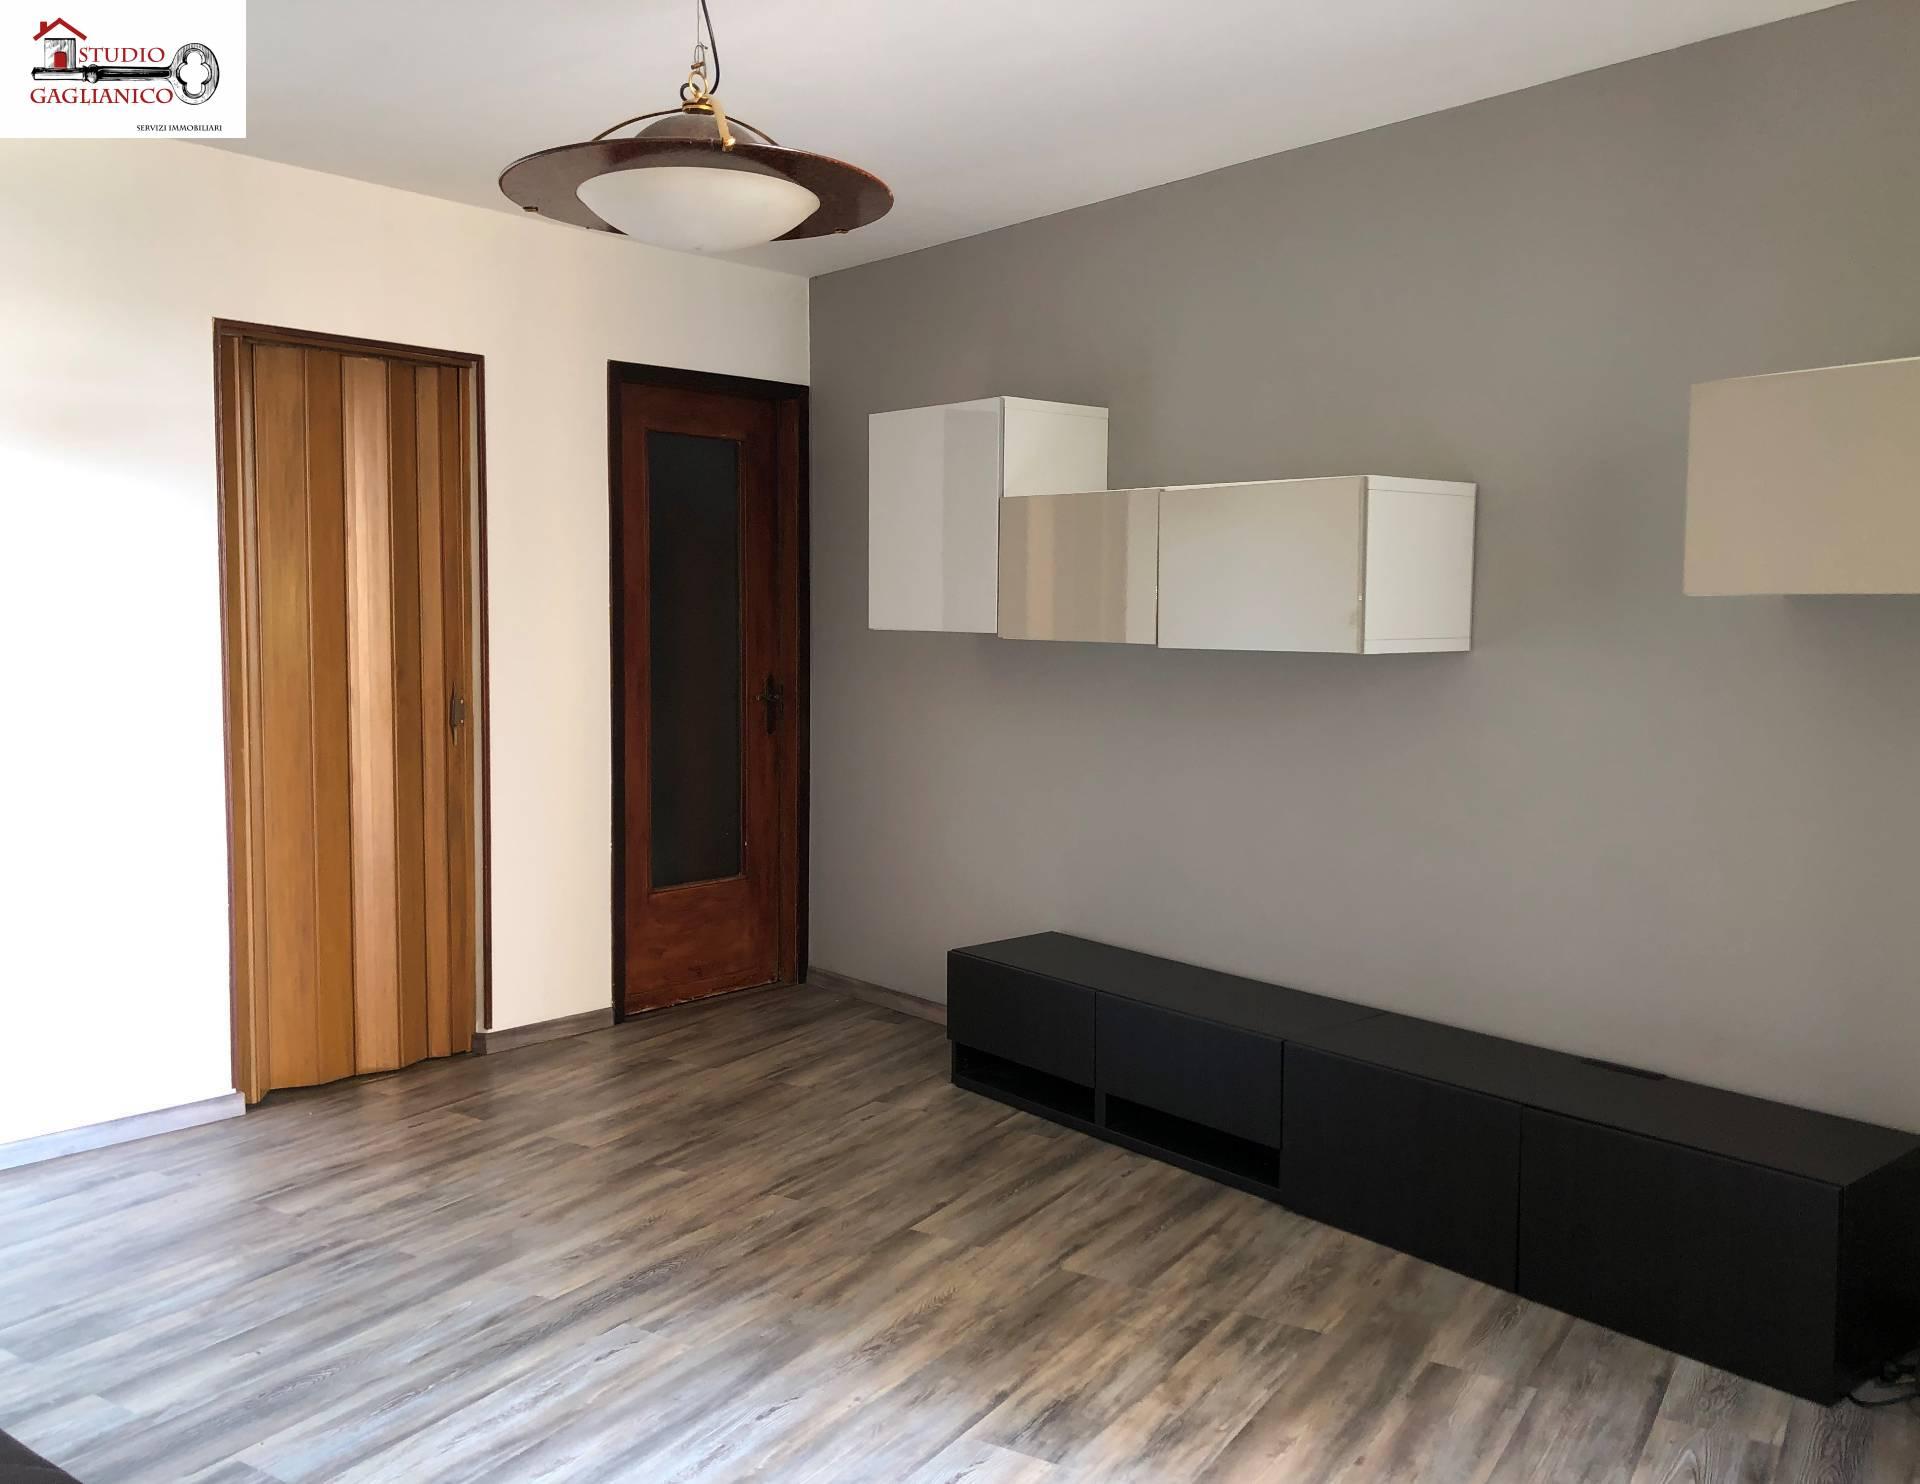 Appartamento in vendita a Biella (BI)